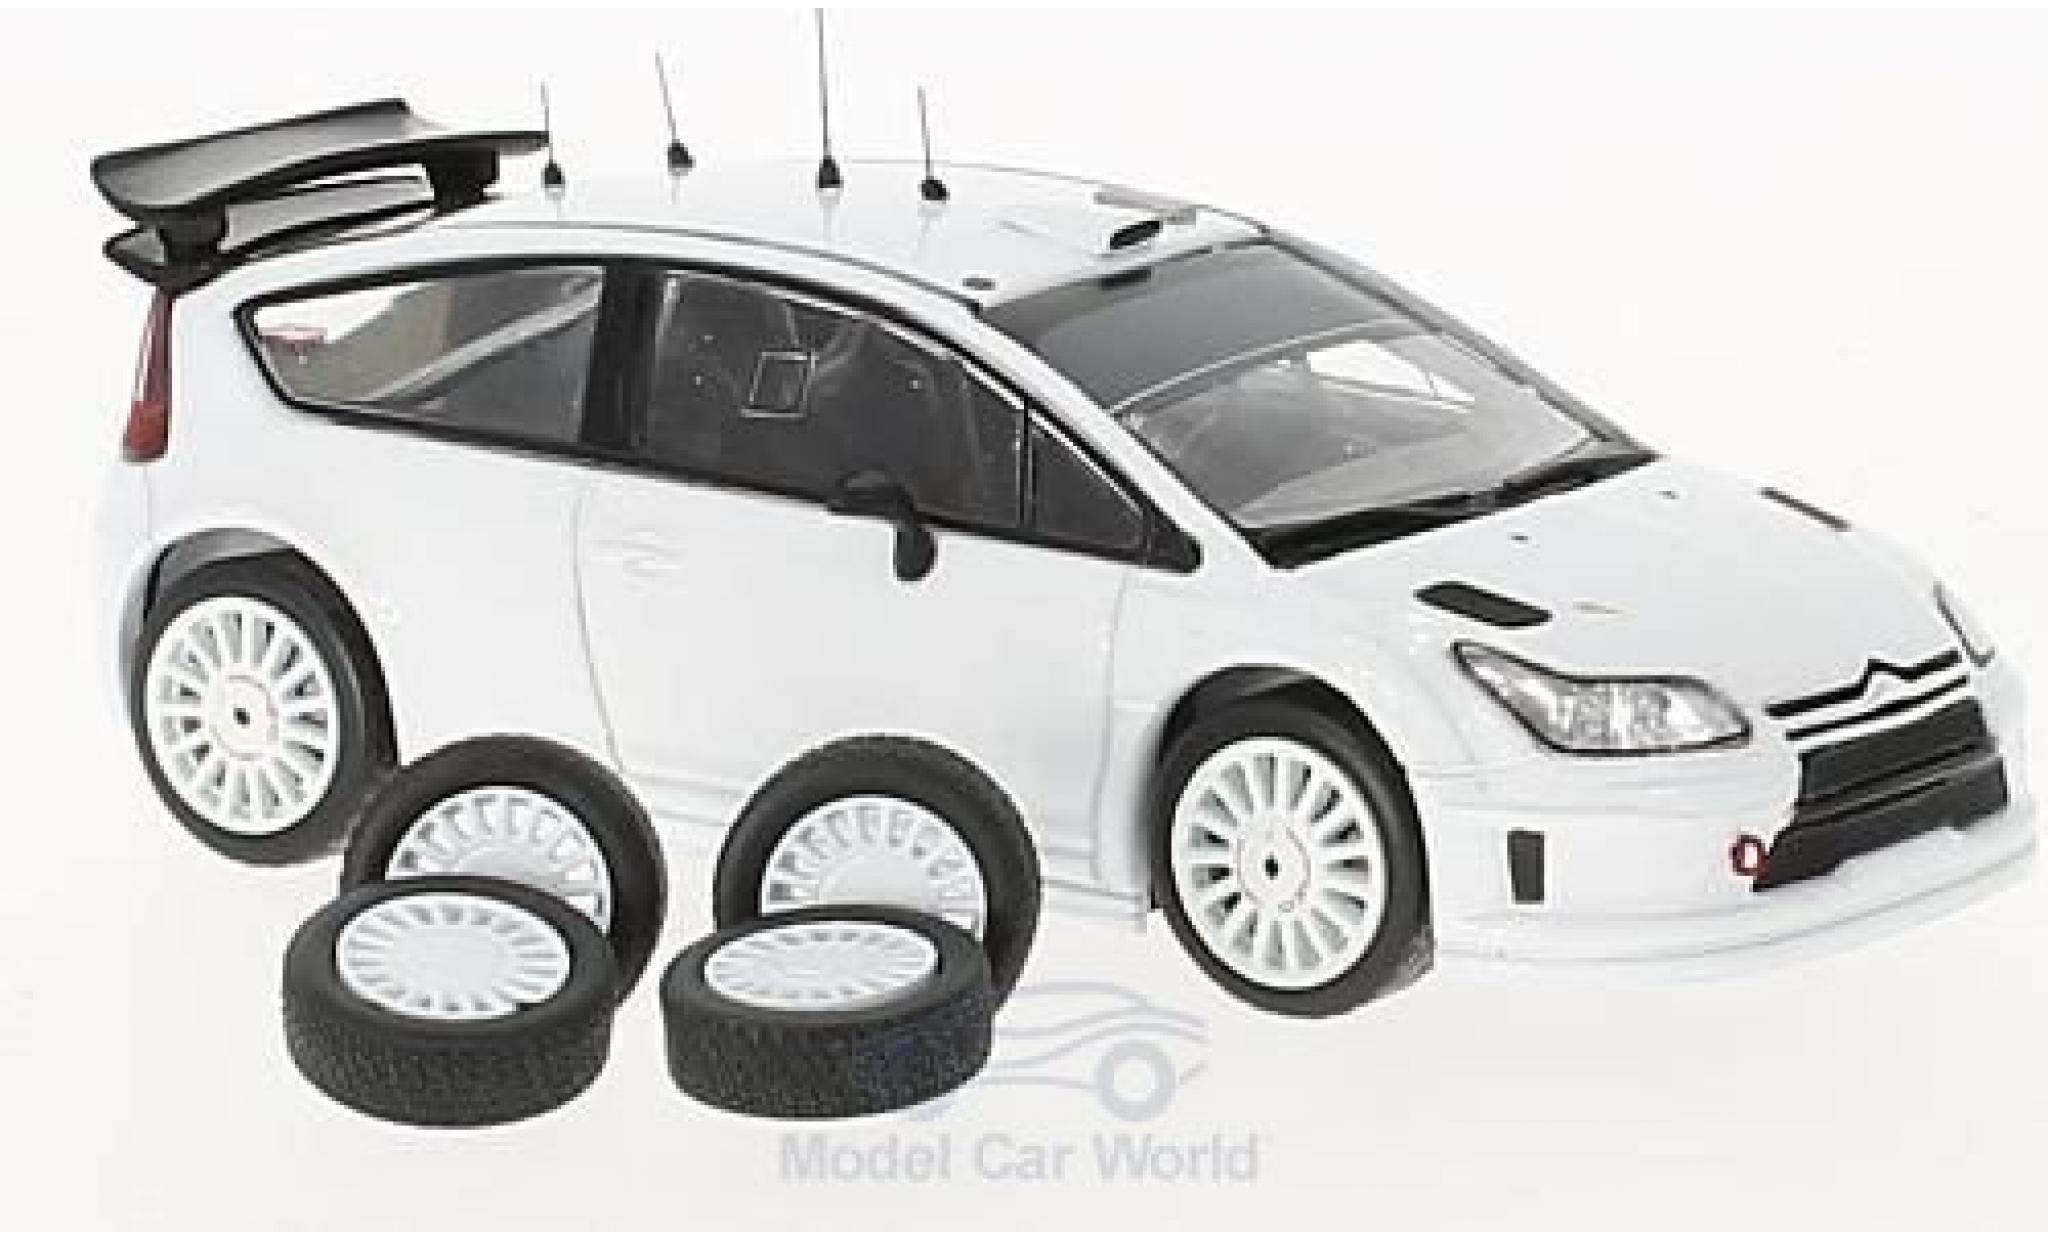 Citroen C4 WRC 1/43 IXO blanche 2010 Plain Body Version inklusive 4 Ersatzräder